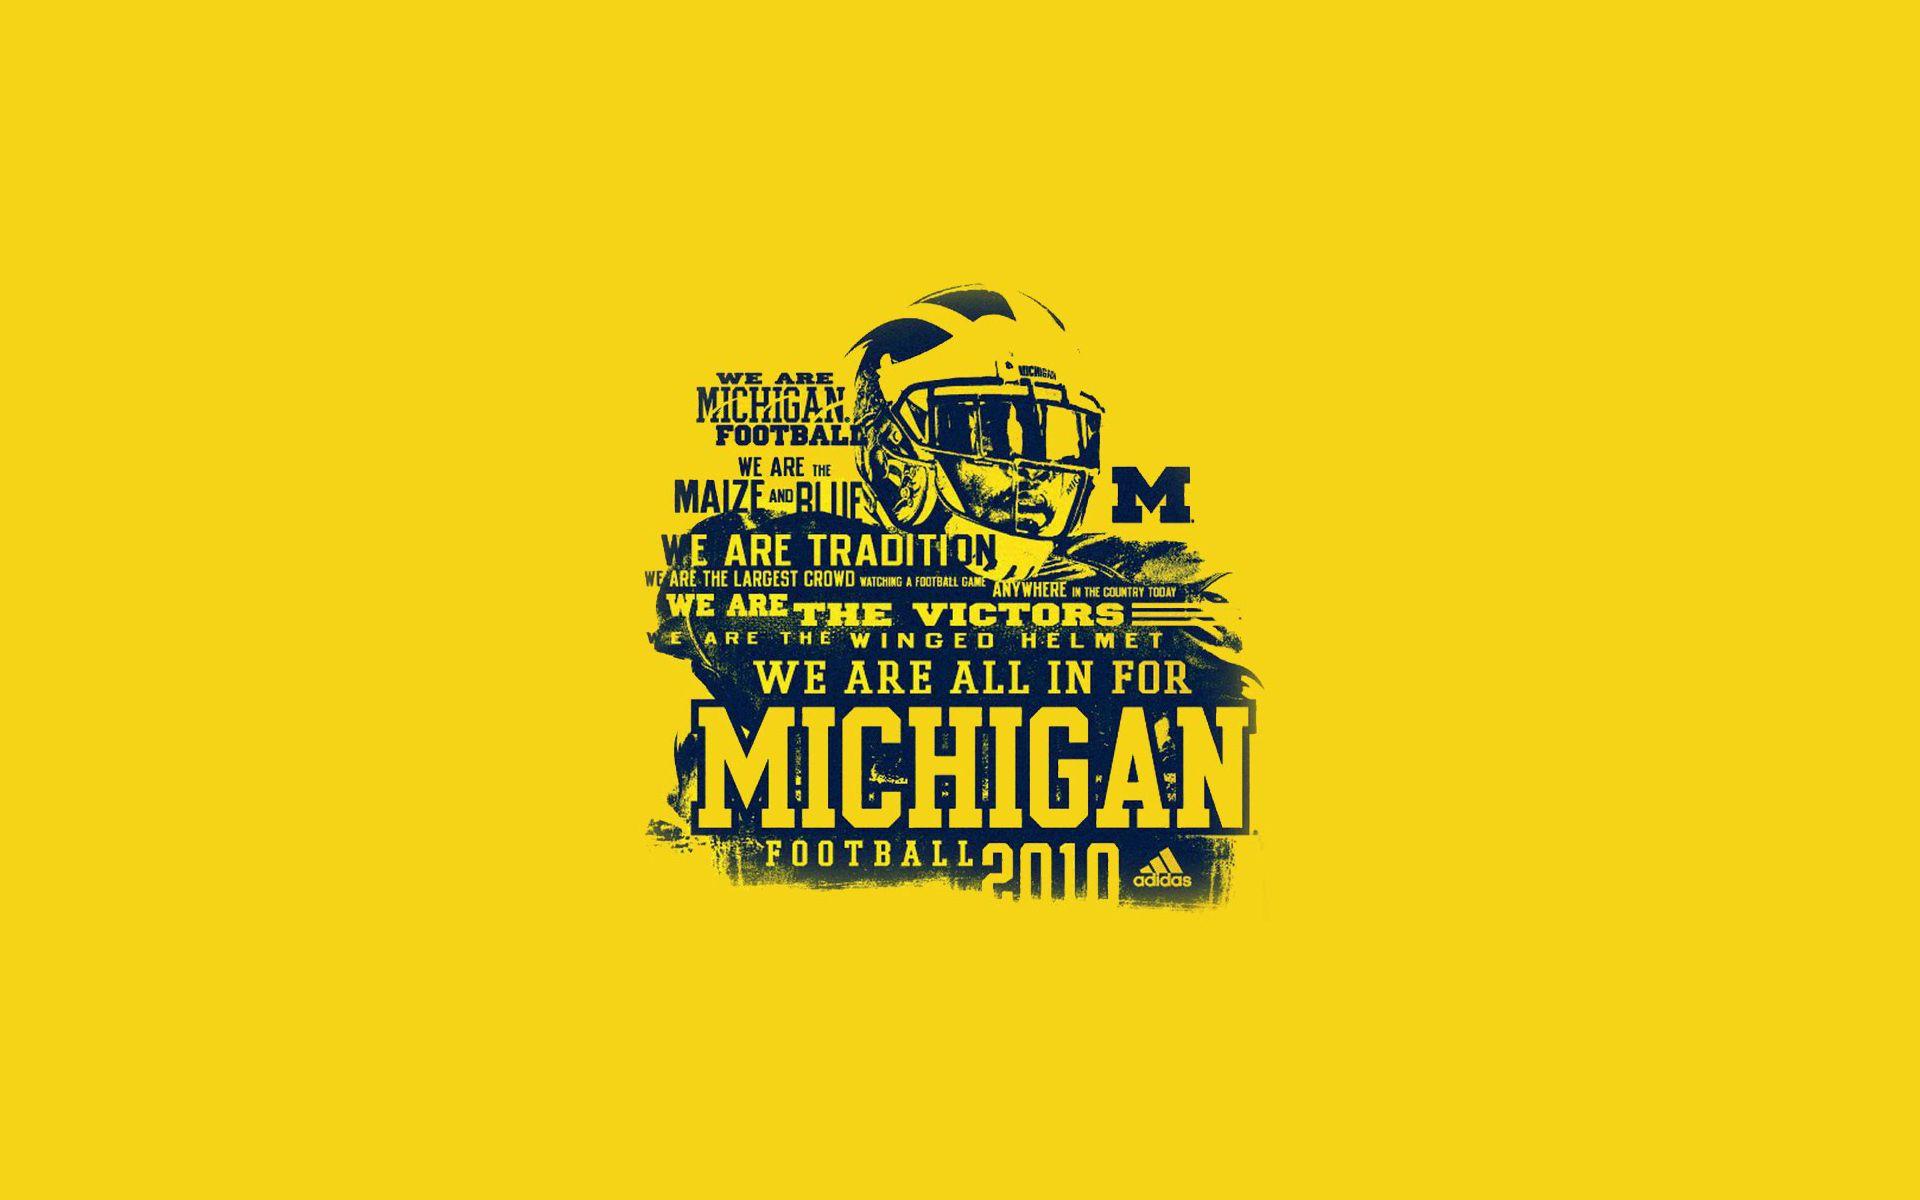 Michigan Wolverines Football Hd Background Game Day Shirts Michigan Wolverines Football Michigan